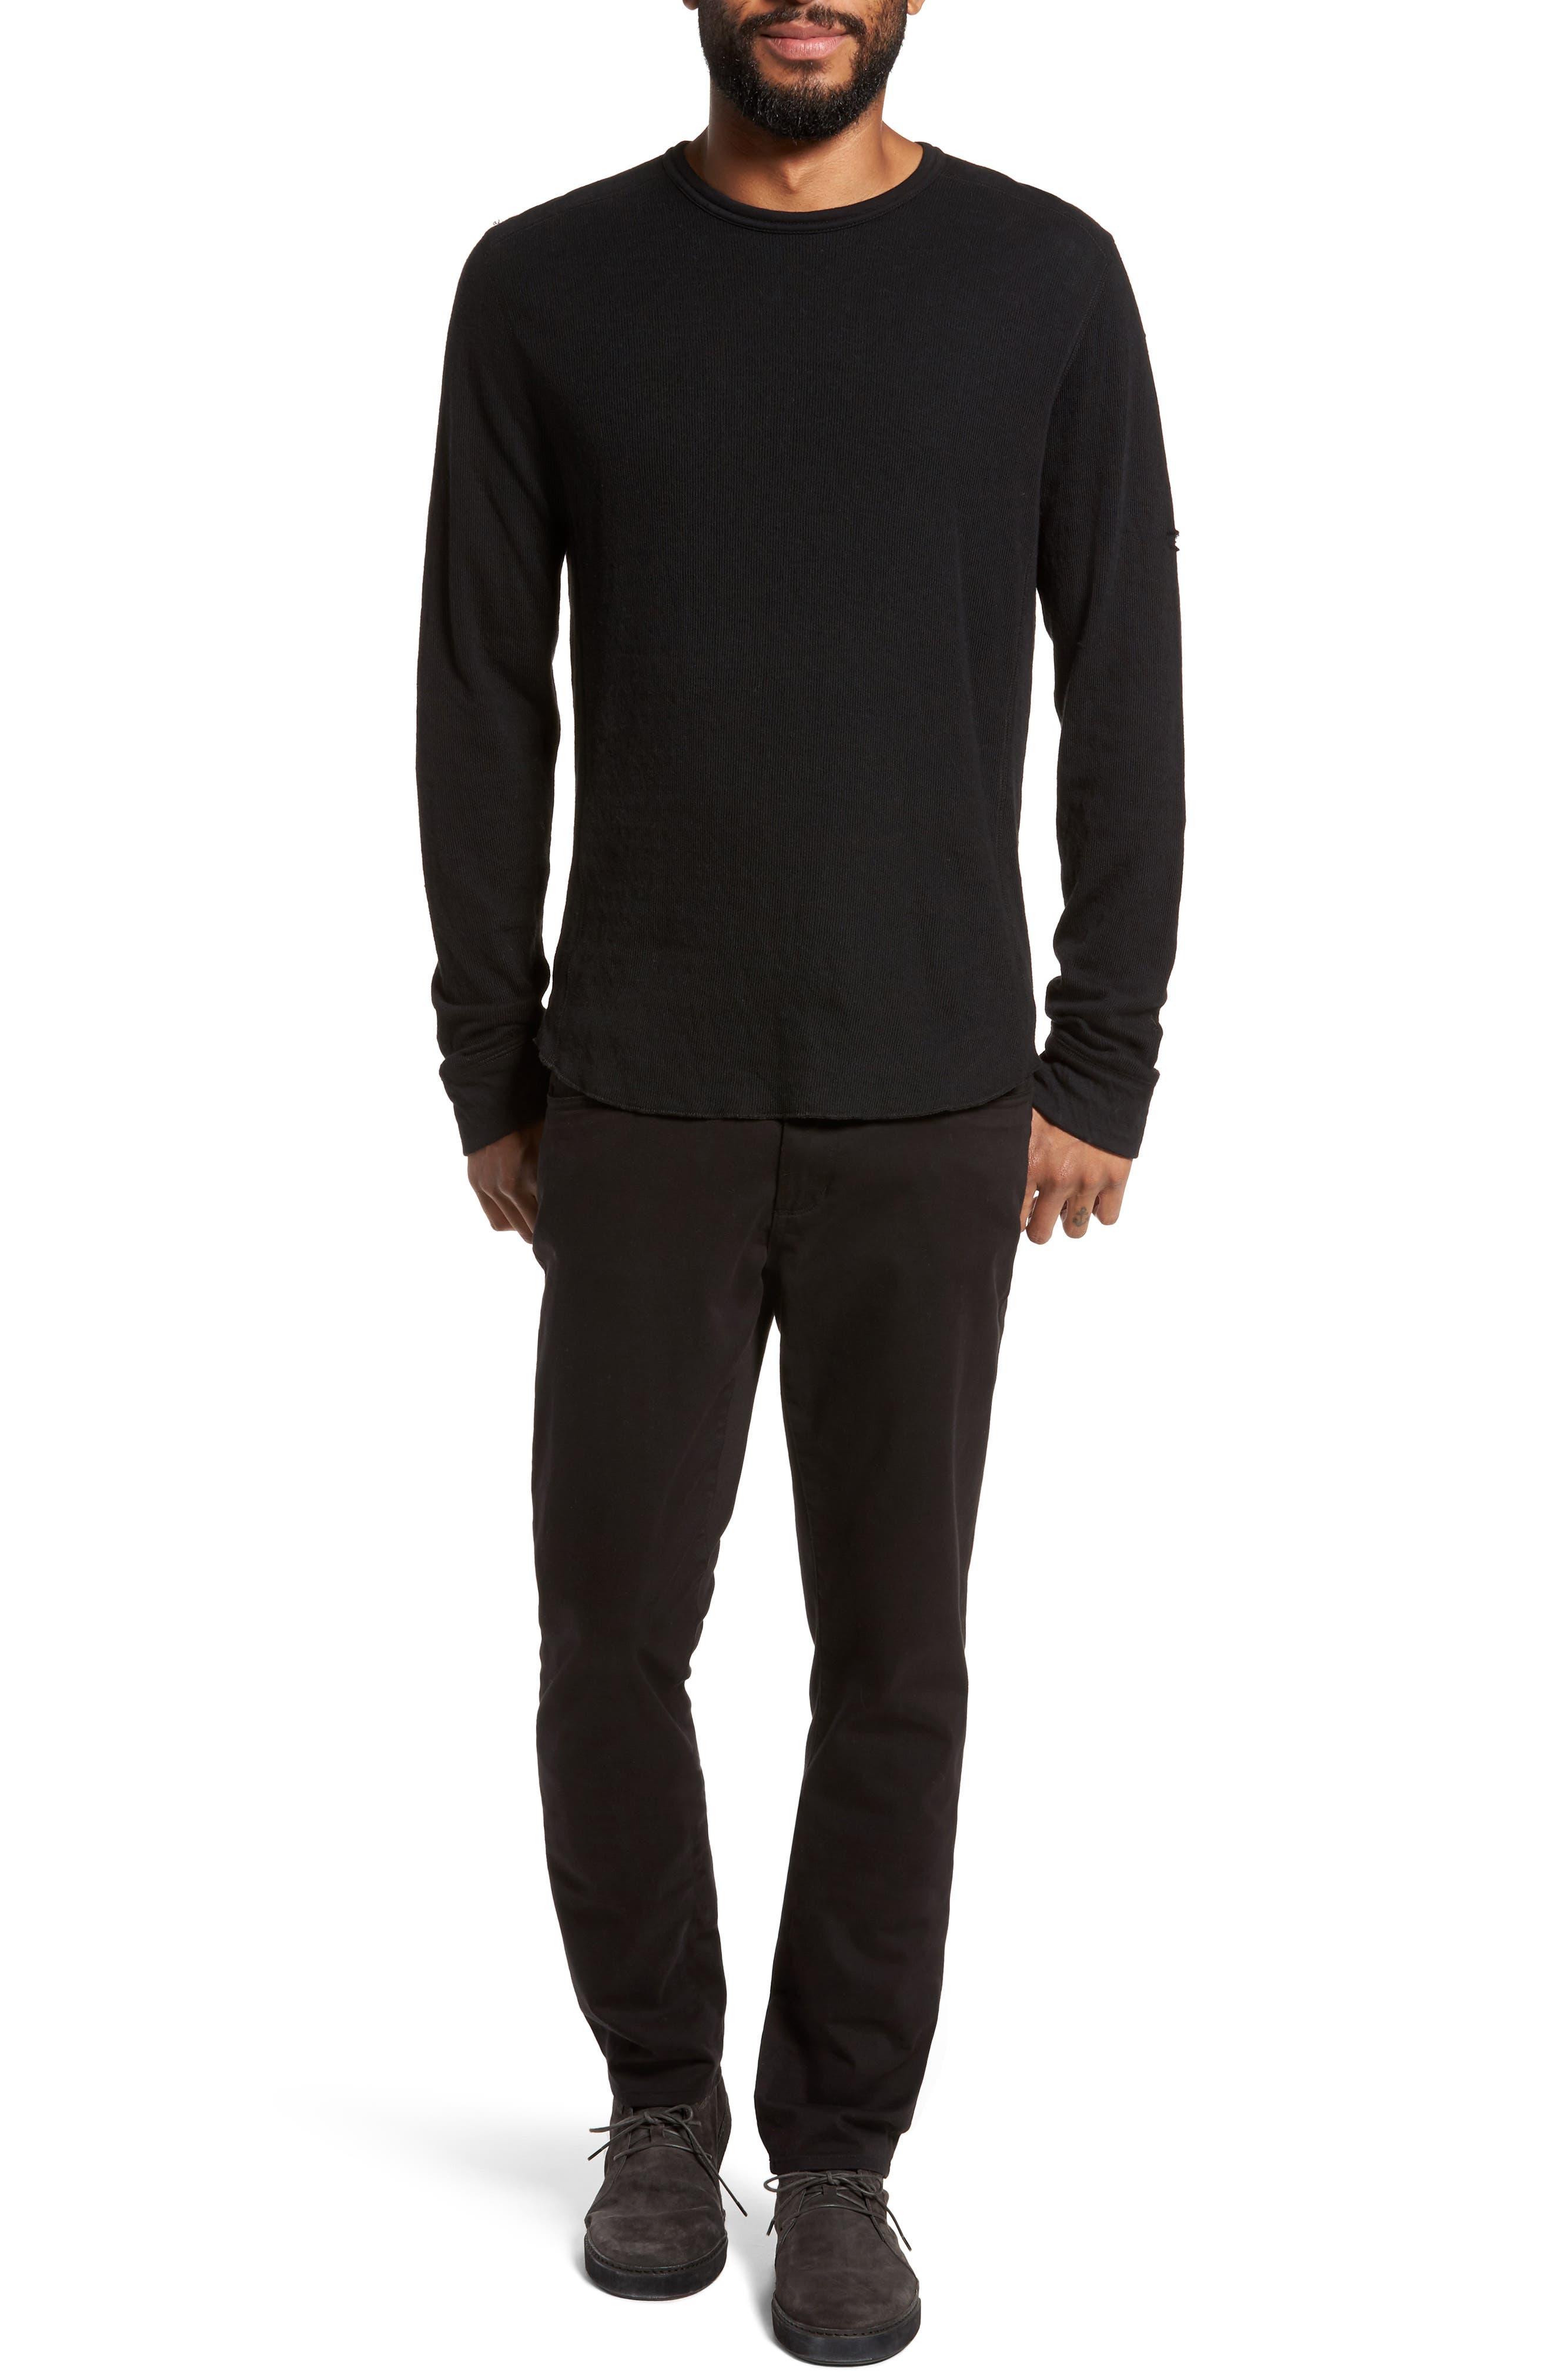 VINCE, Double Knit Long Sleeve T-Shirt, Alternate thumbnail 7, color, BLACK